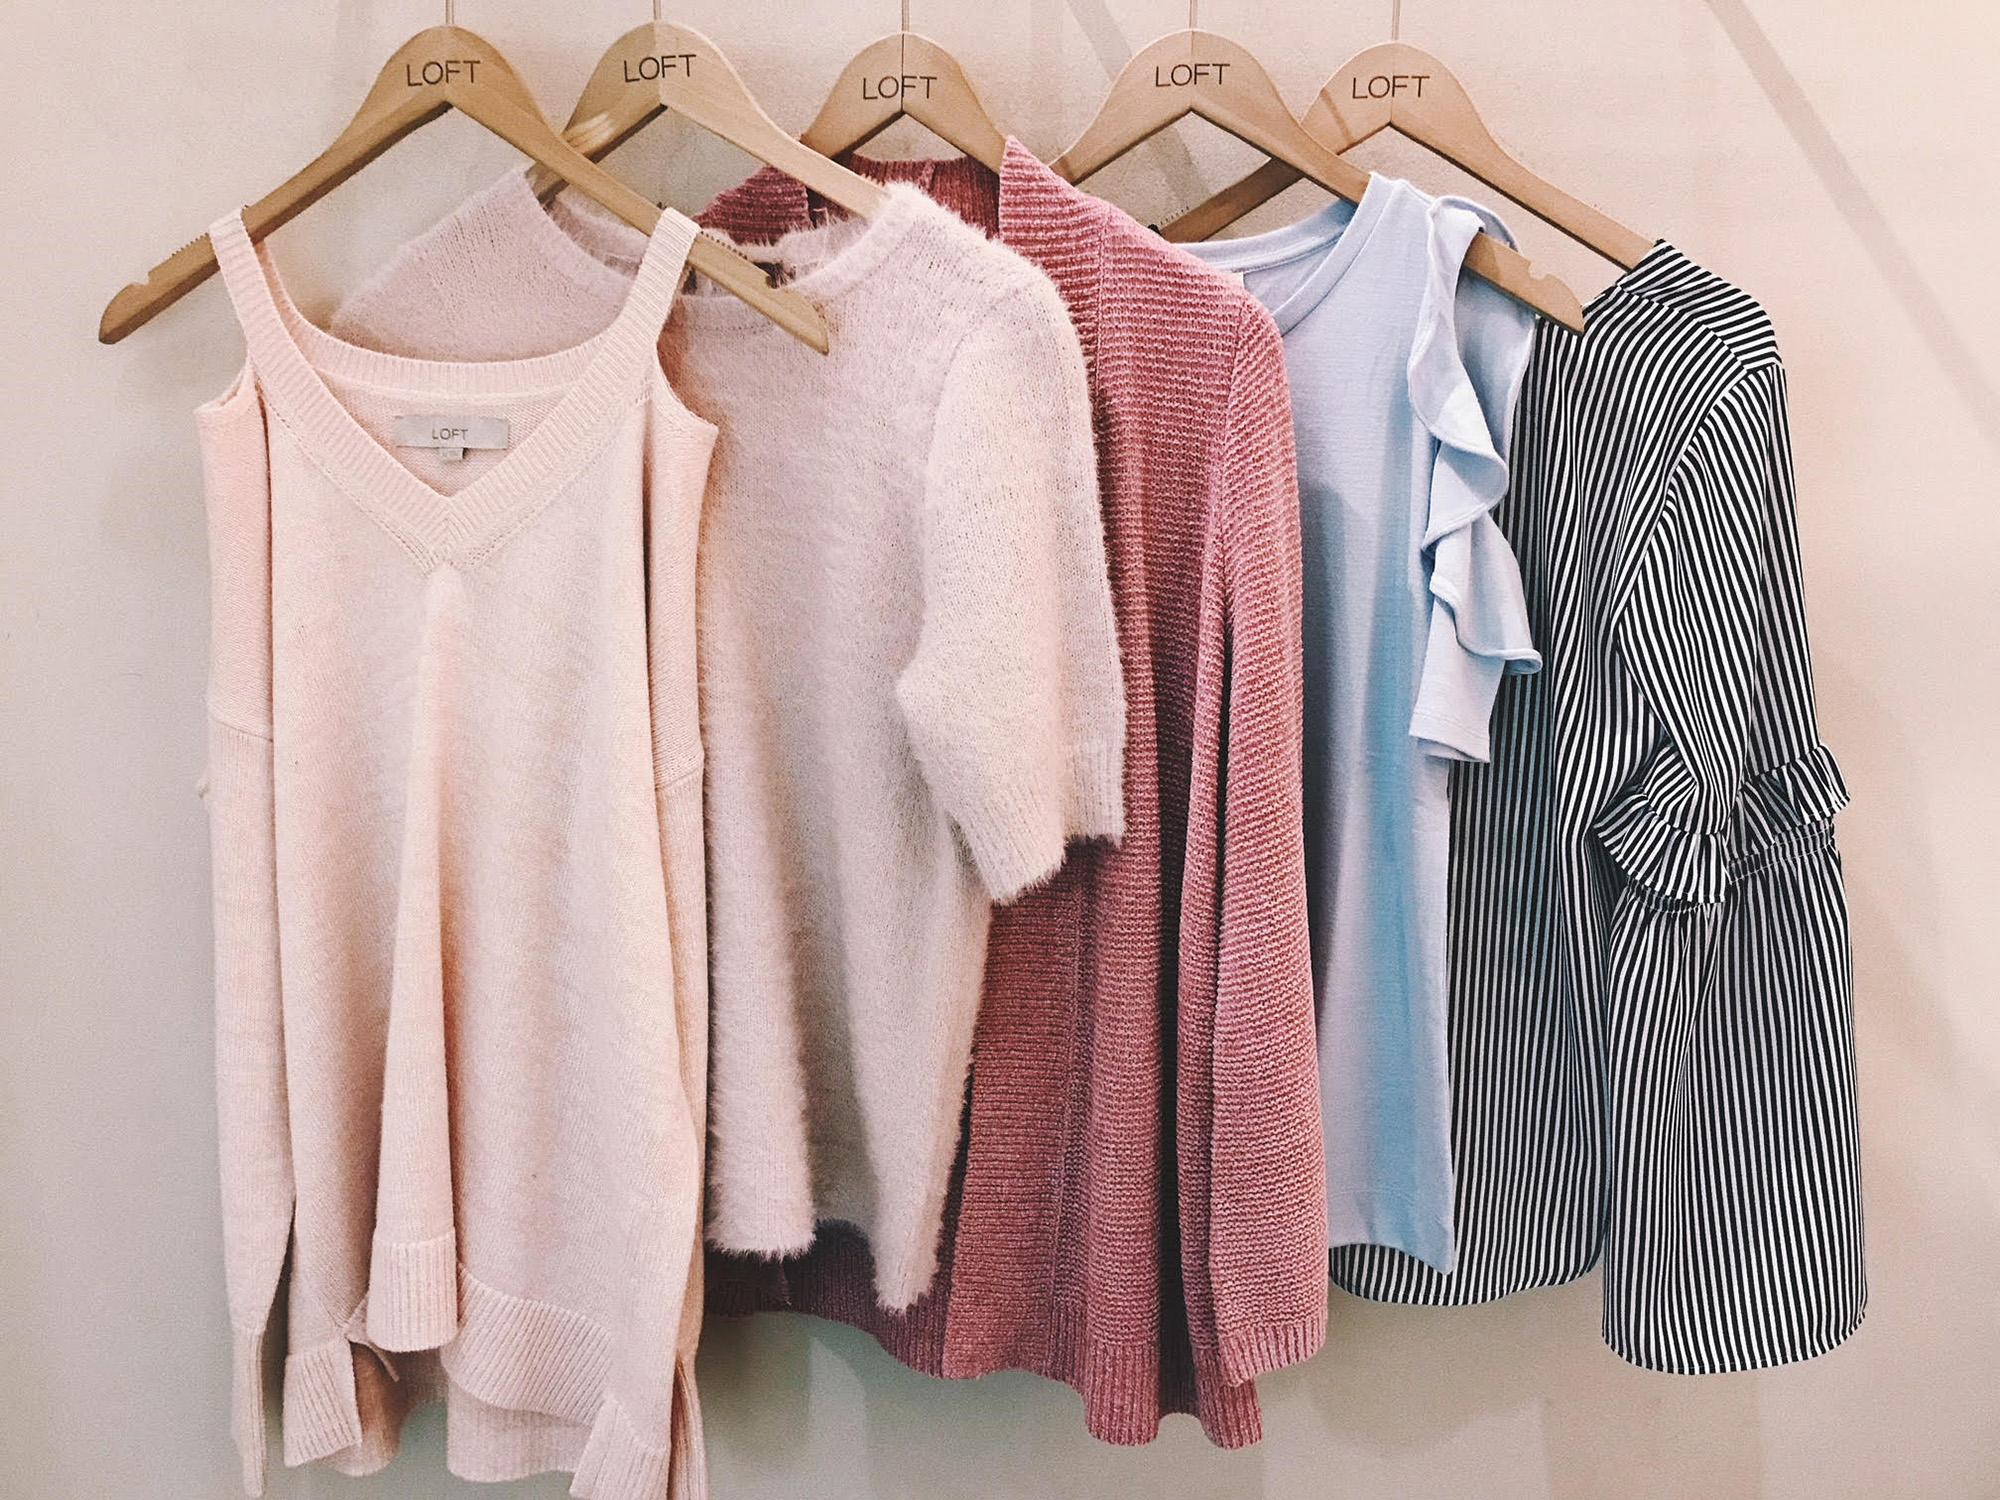 a36409979a5e4 LOFT Dressing Room Try On - February 2018